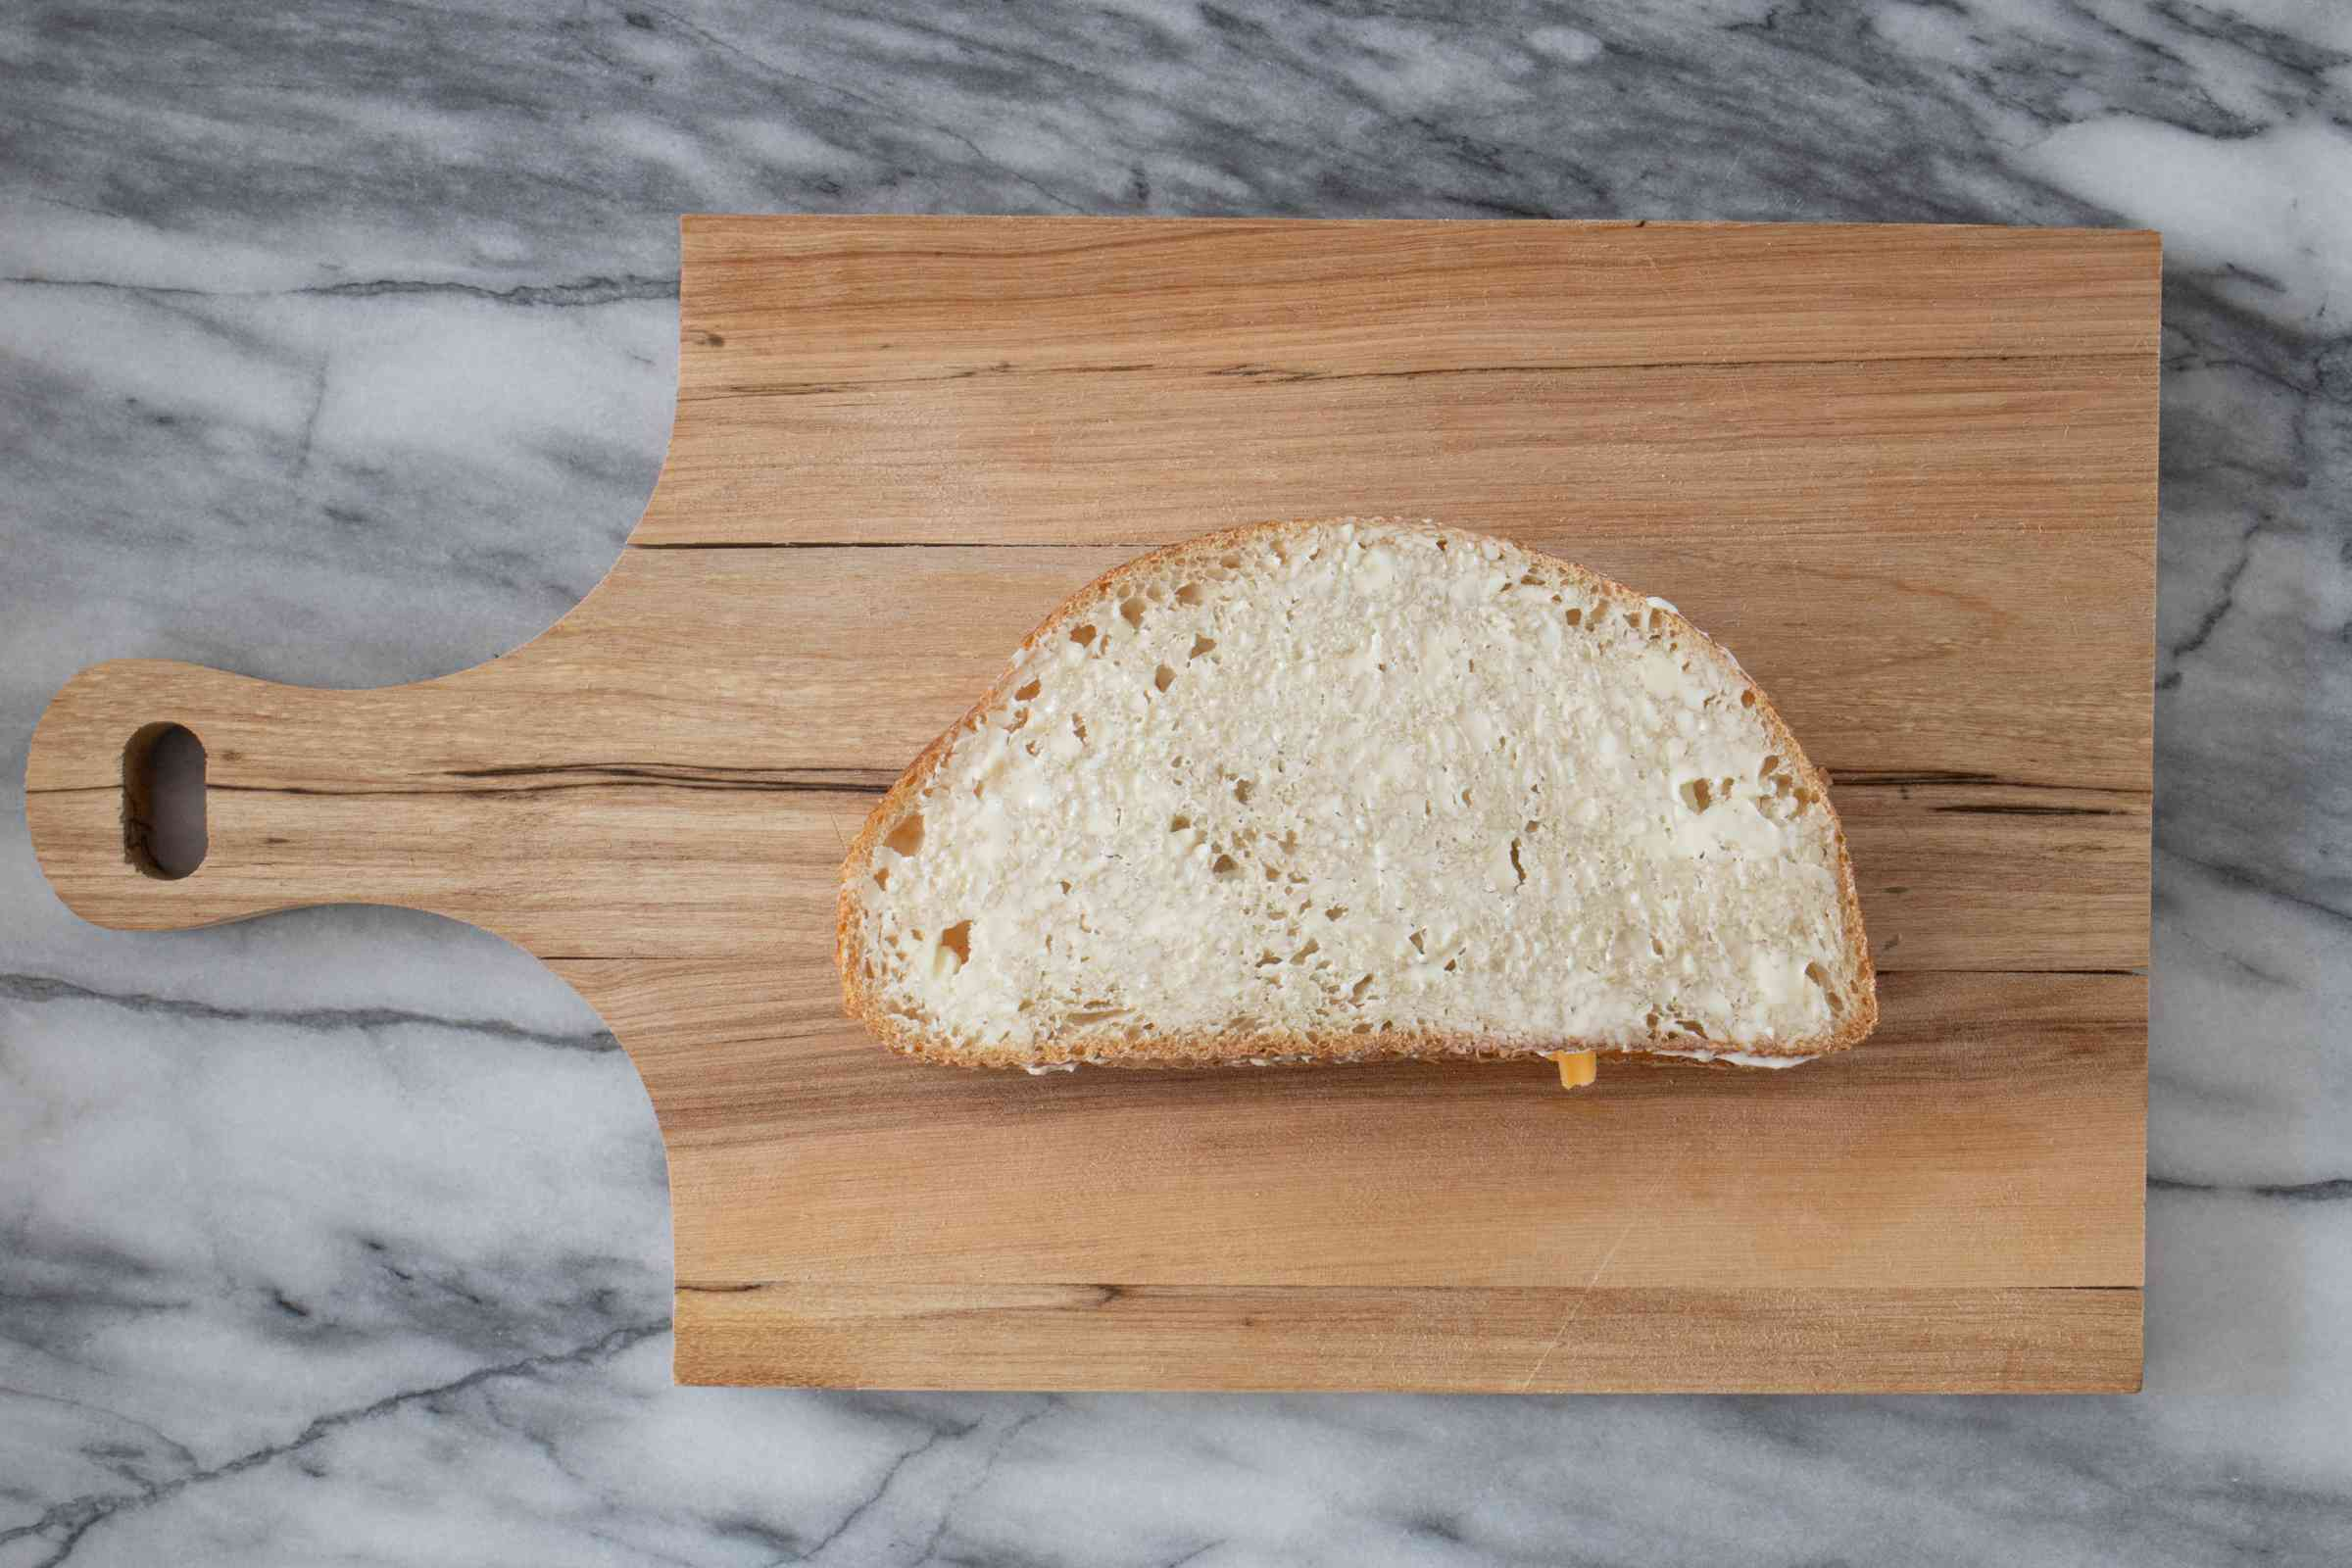 buttered sandwich on a cutting board